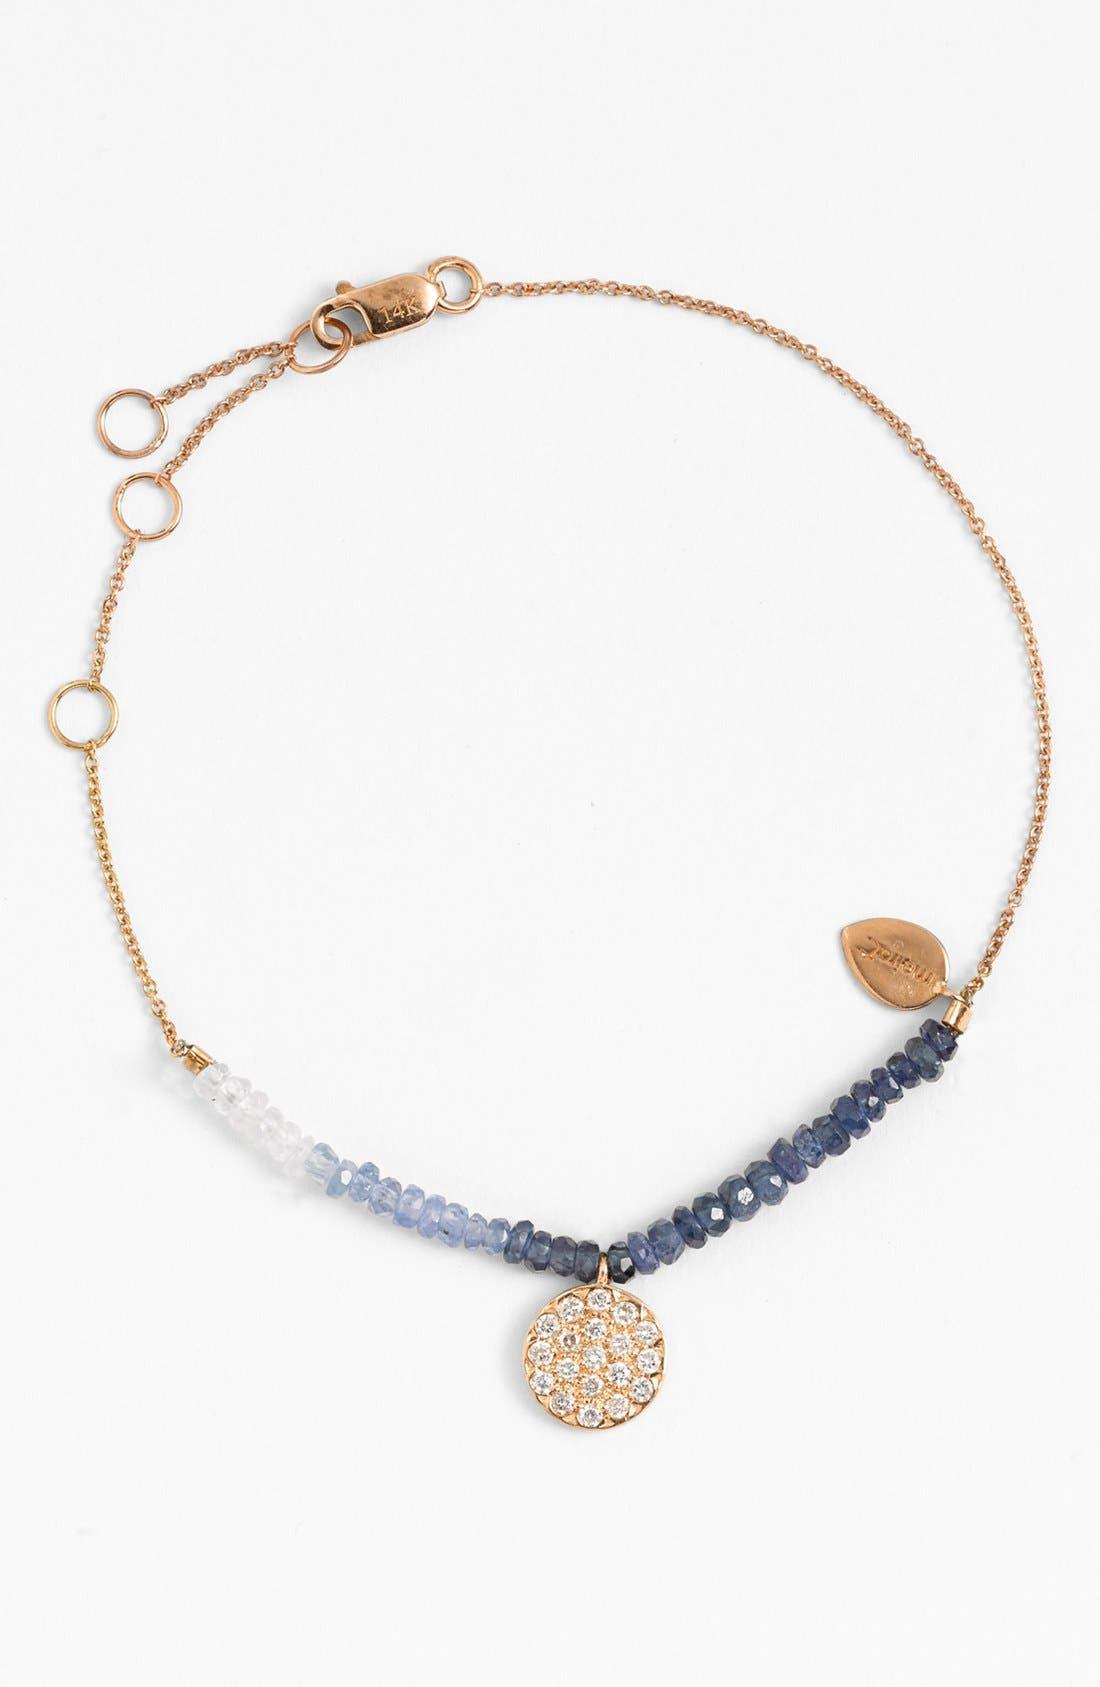 Main Image - MeiraT 'Dazzling' Diamond & Sapphire Bracelet